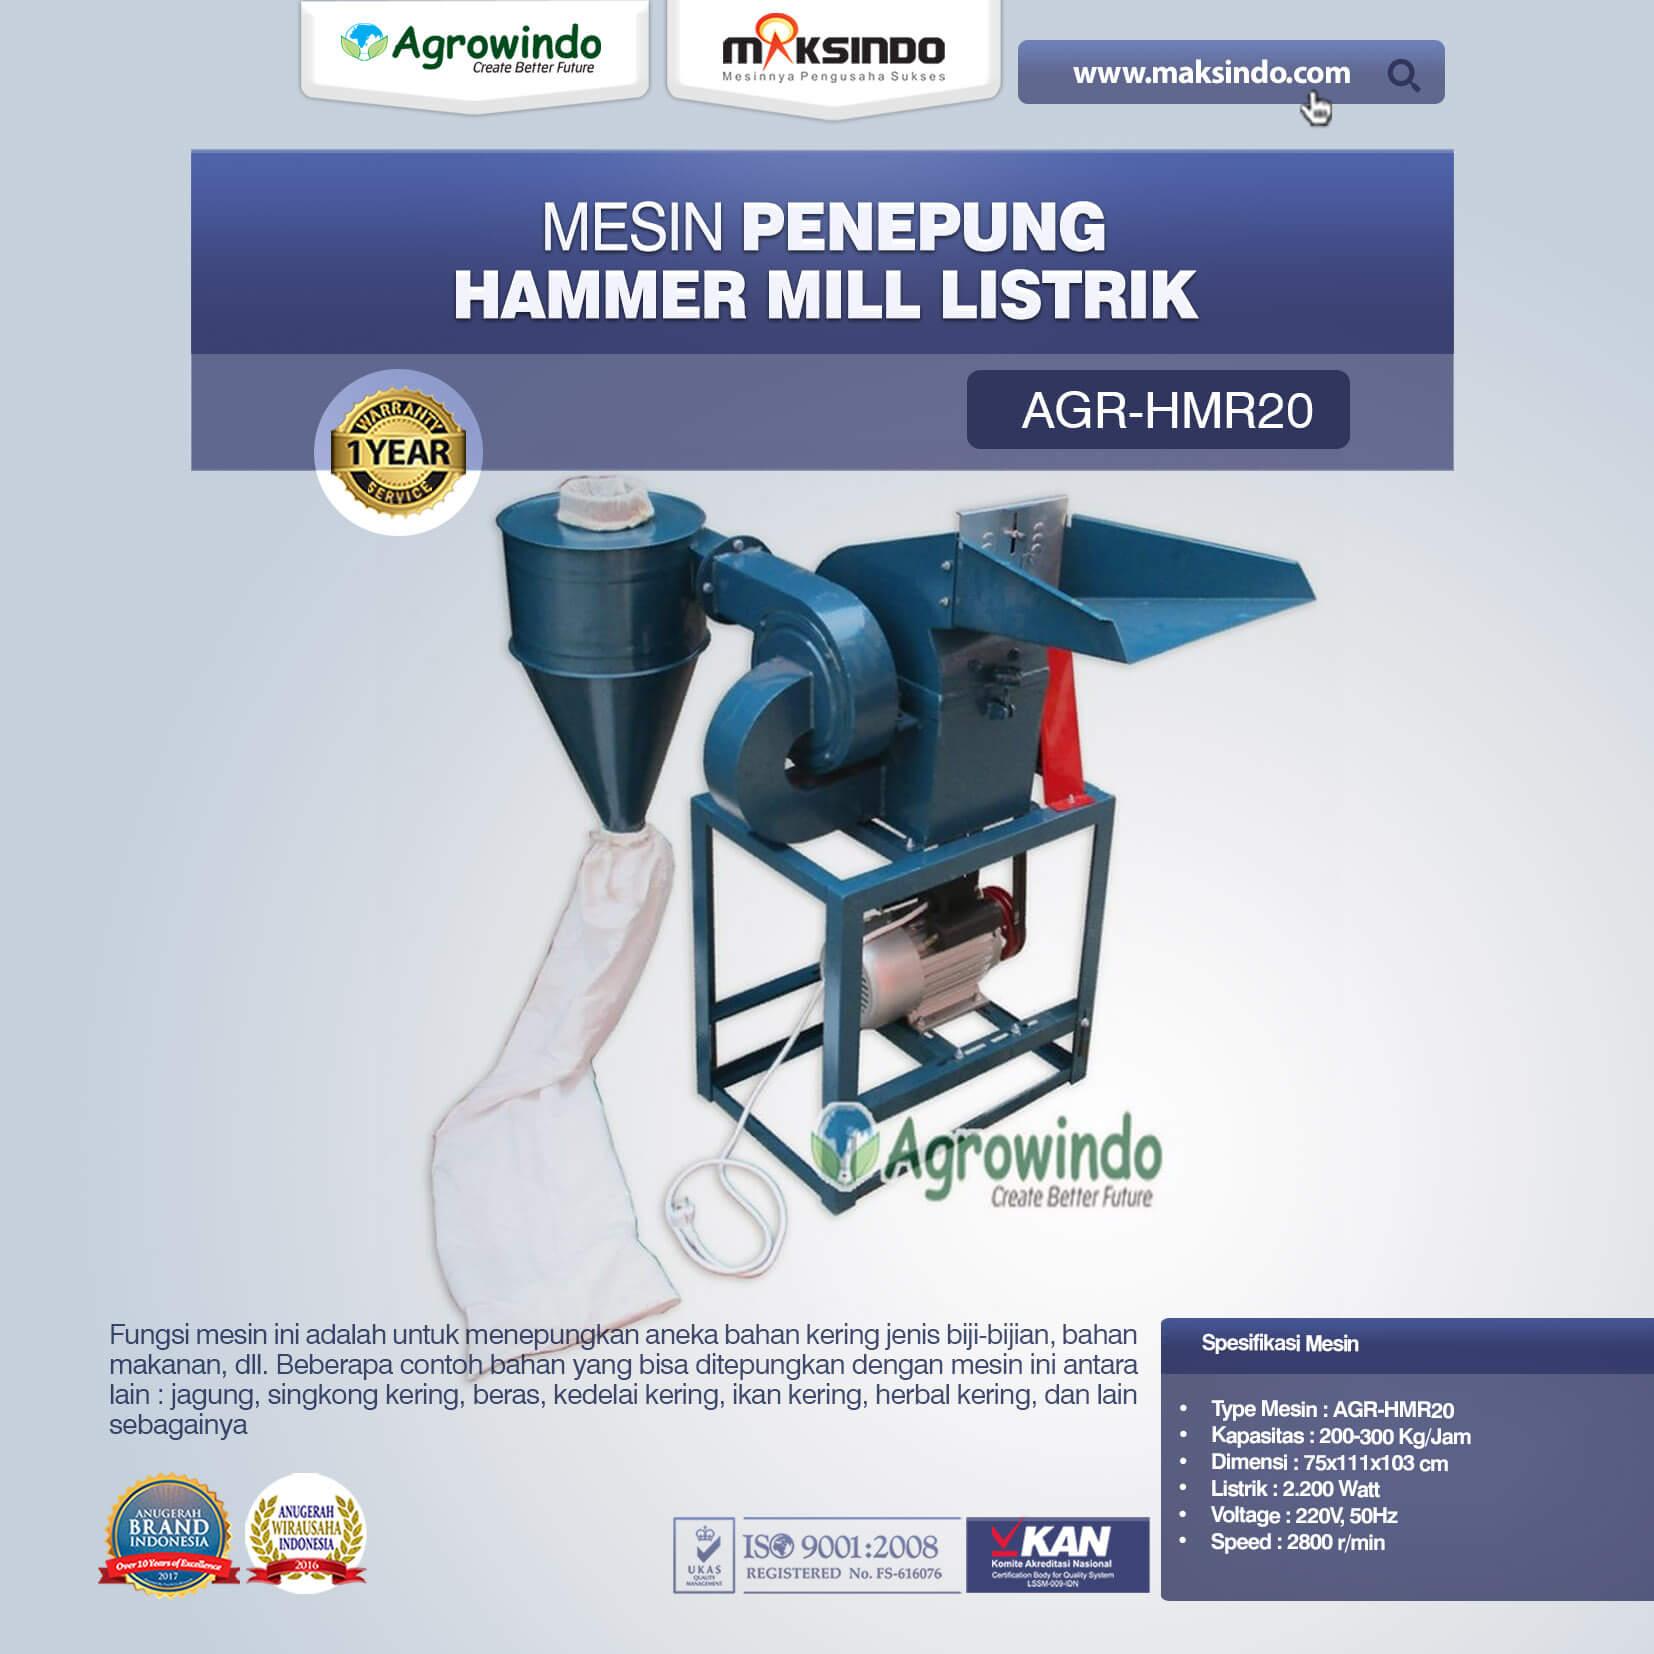 Mesin Penepung Hammer Mill Listrik AGR-HMR20 (1)